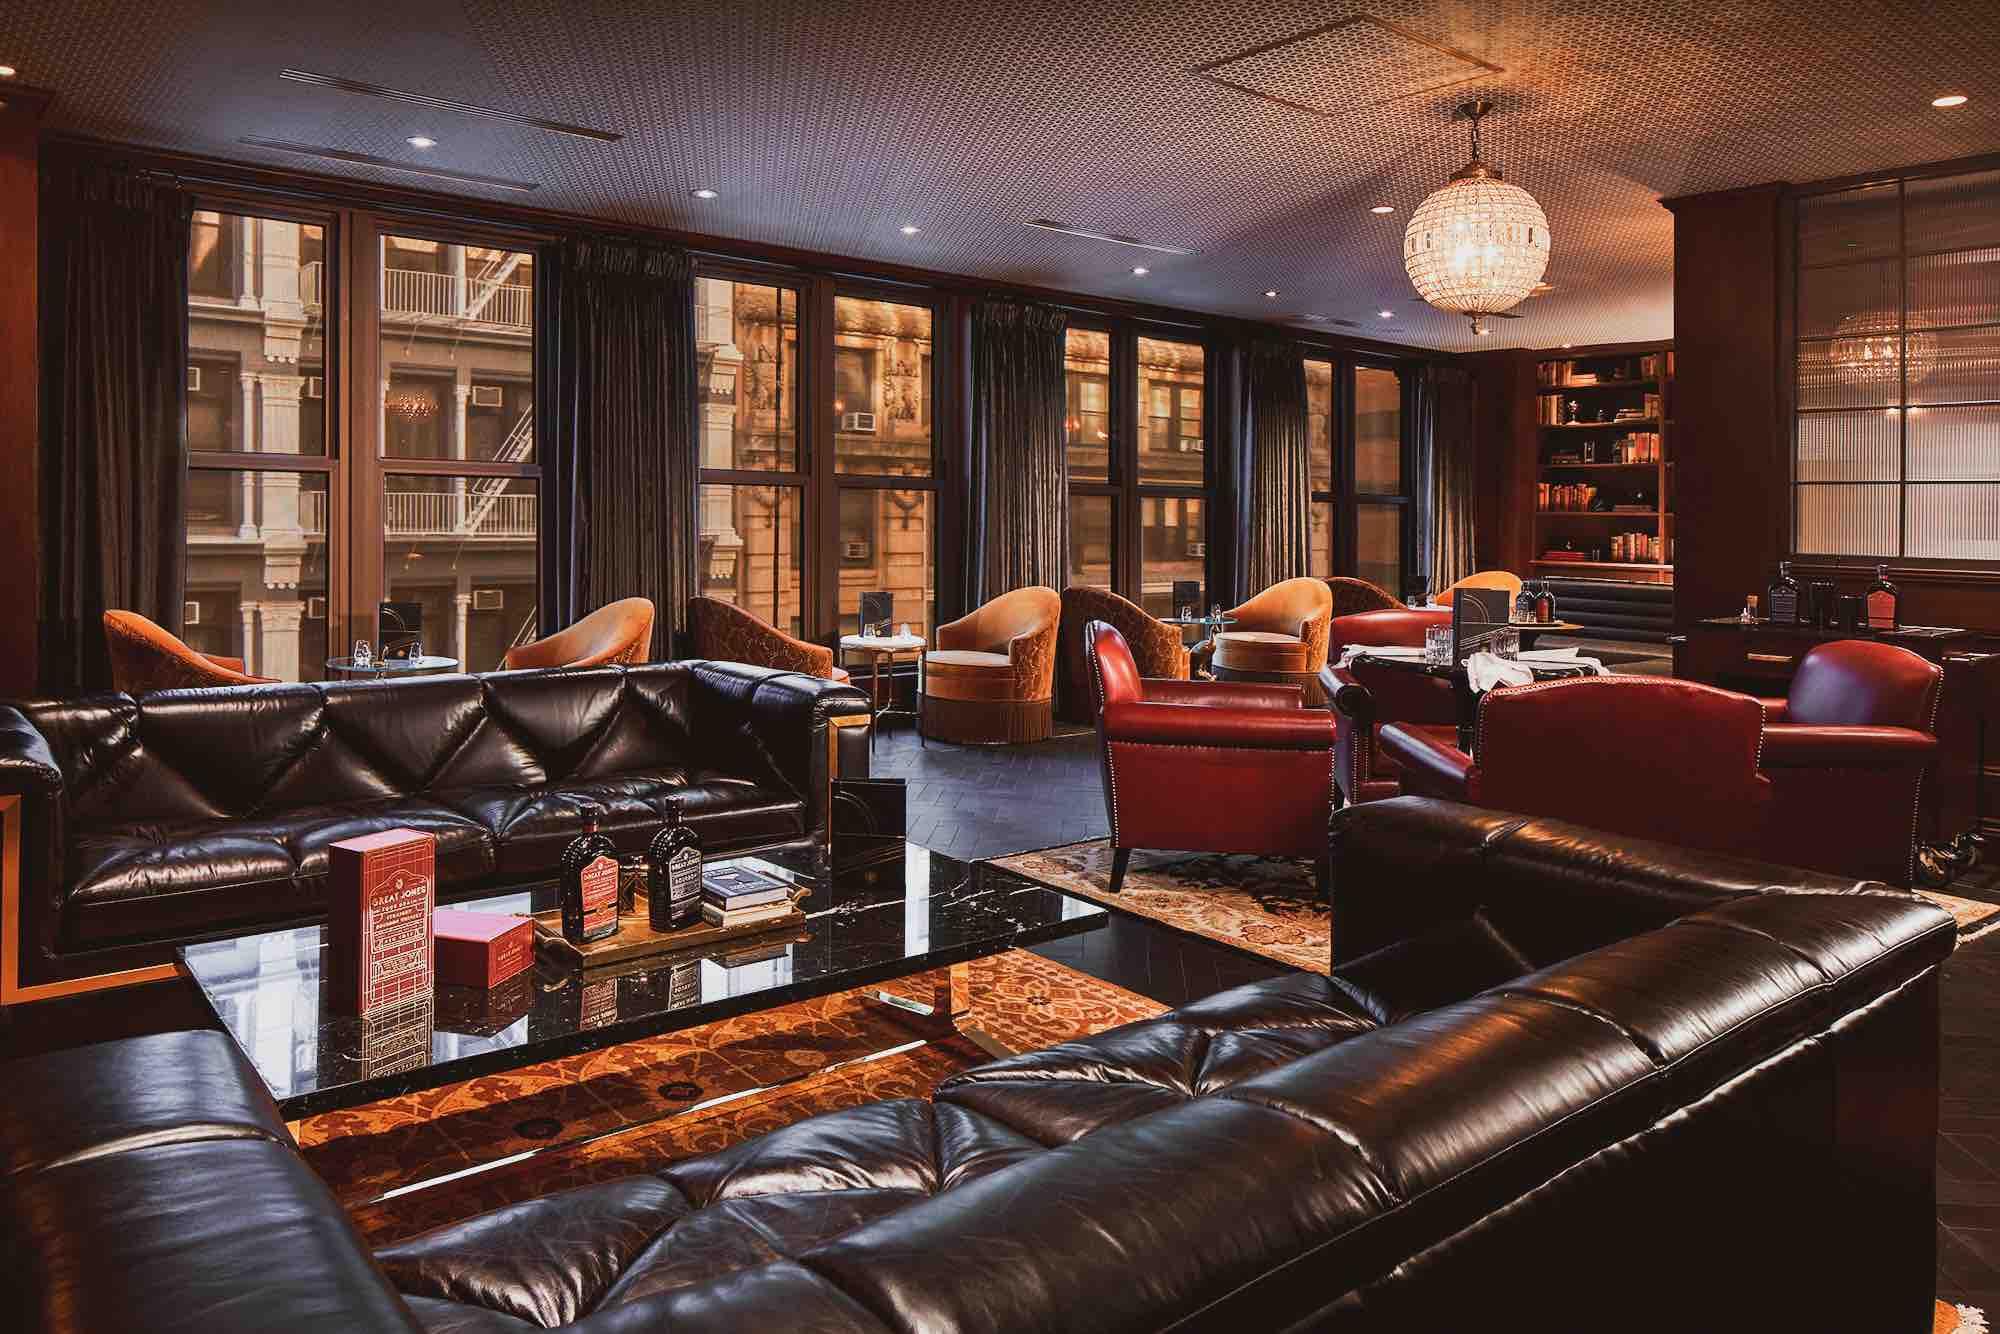 The Lounge At Great Jones Distilling Co Opens Whiskey Distillery in Manhattan's NoHo Neighborhood